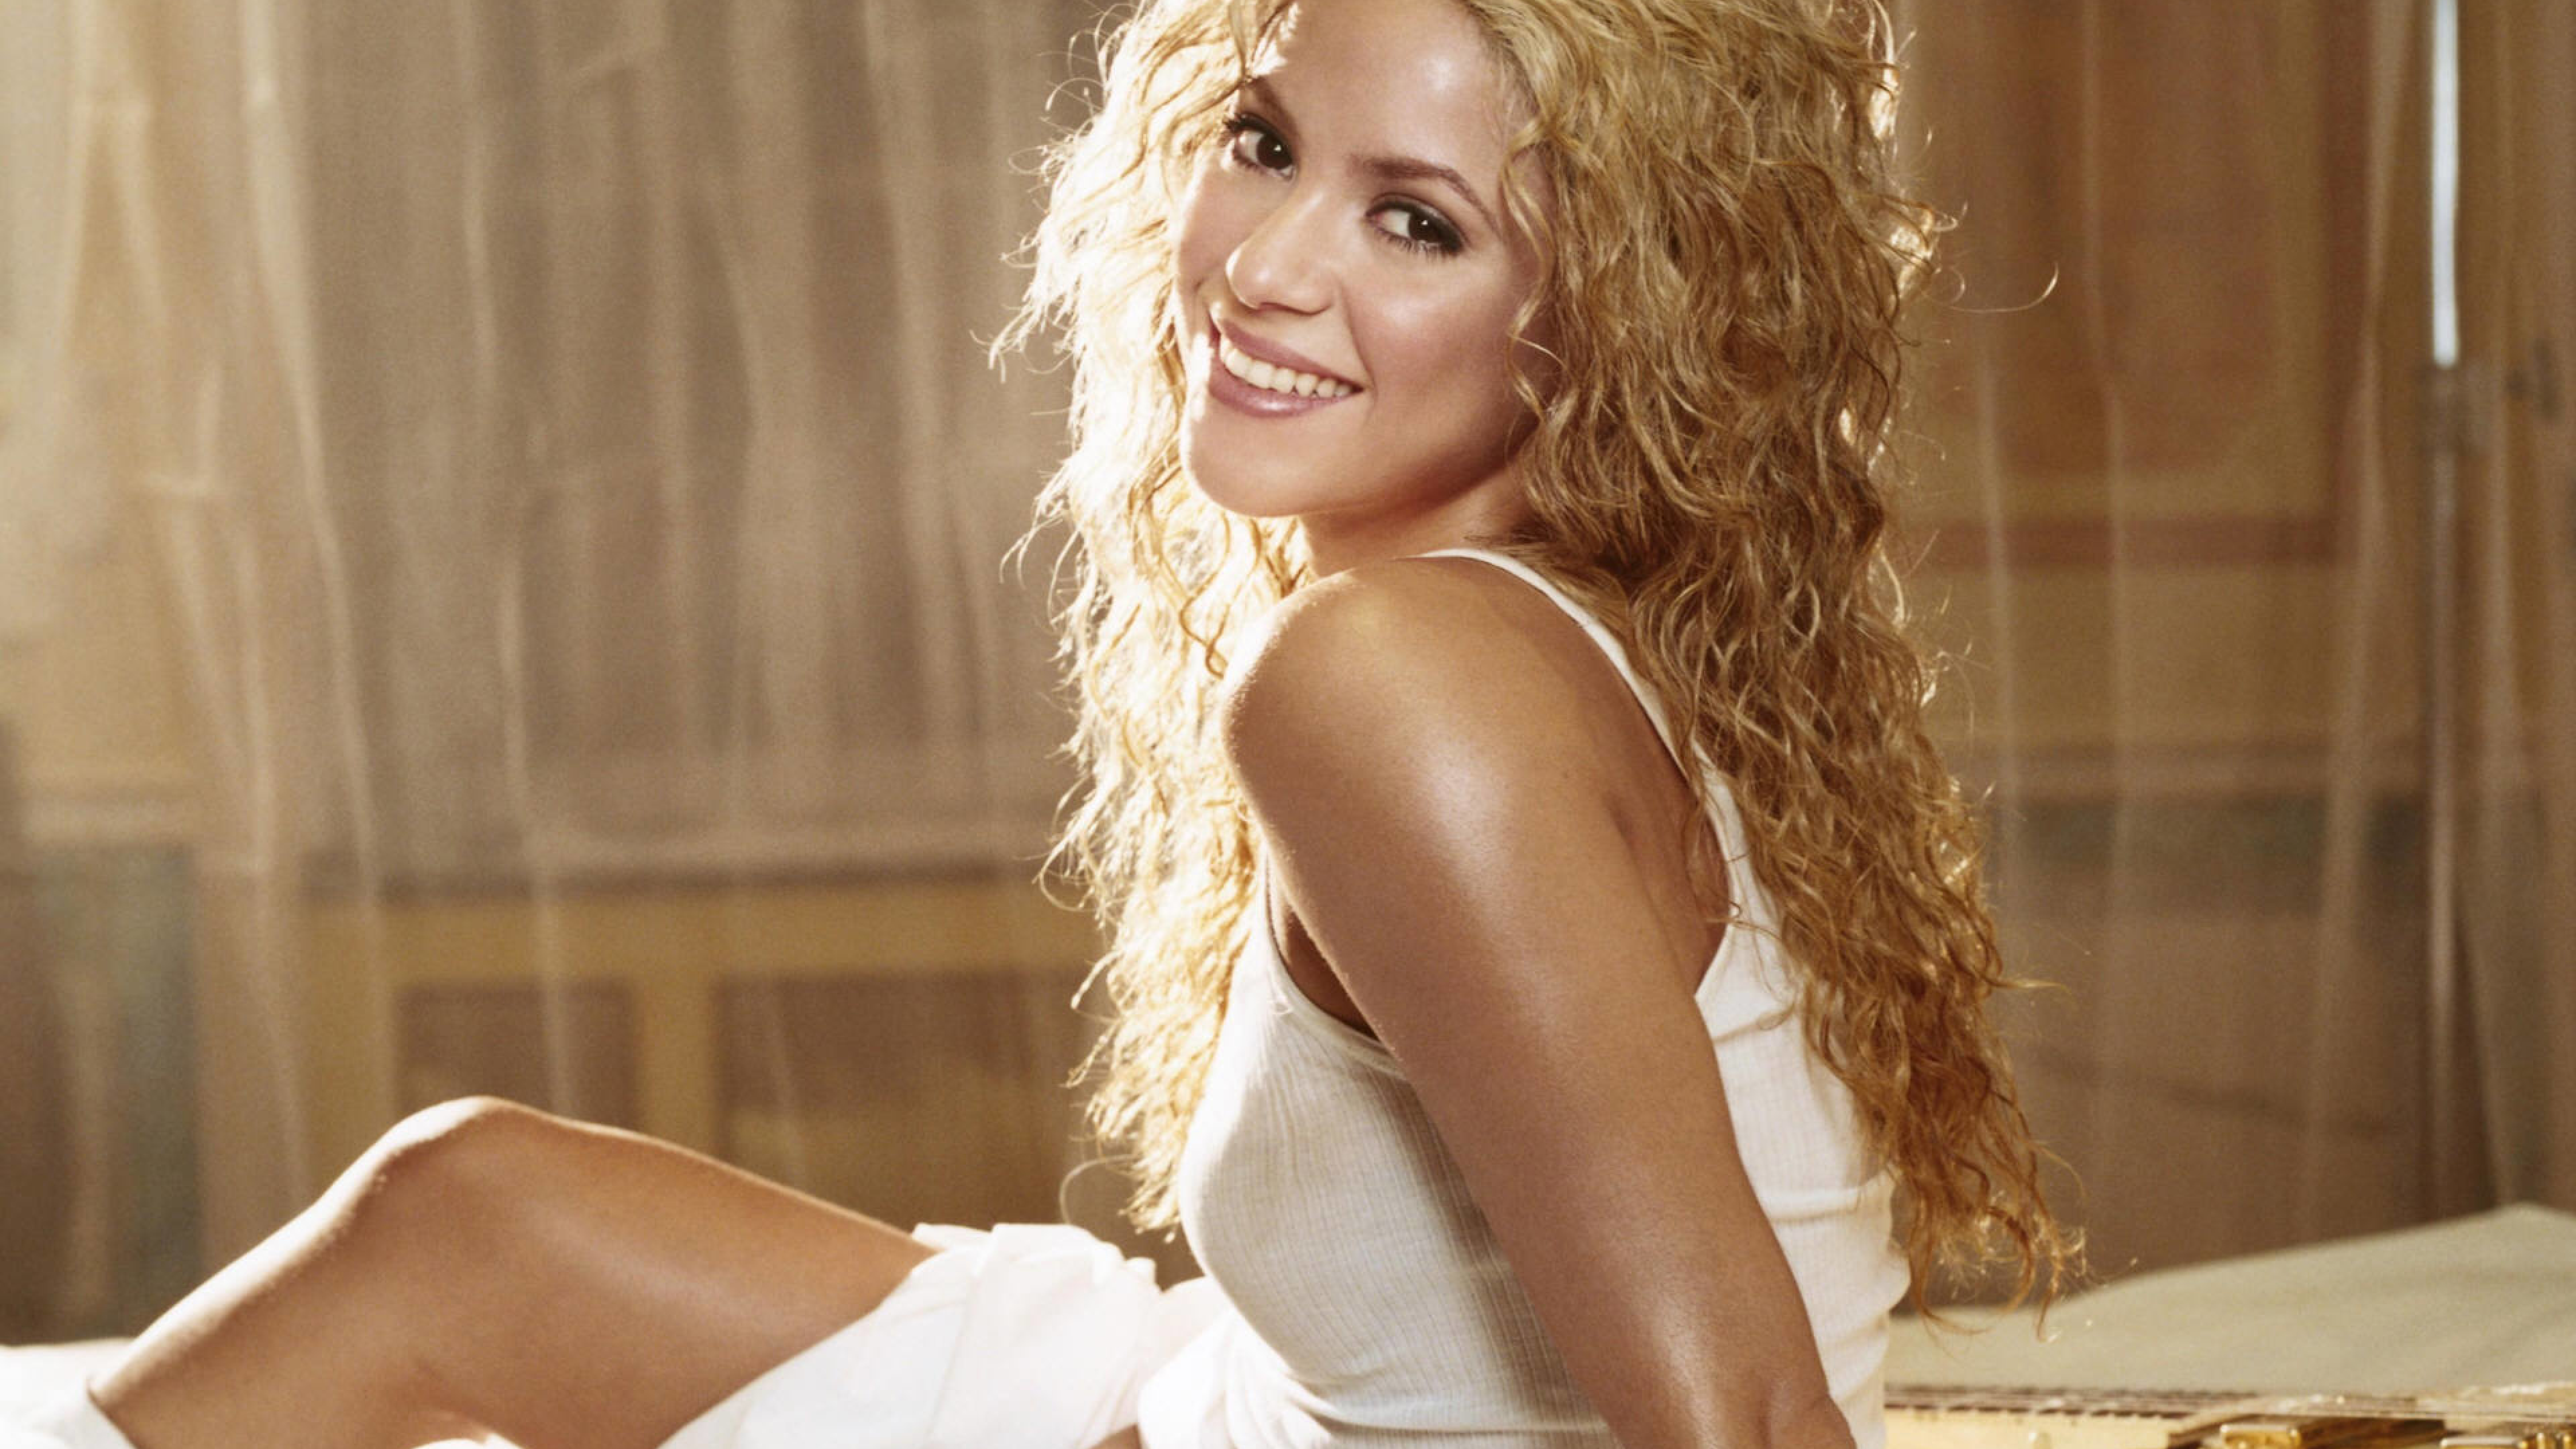 Shakira Smile Photoshoot, Full Hd Wallpaper-5044